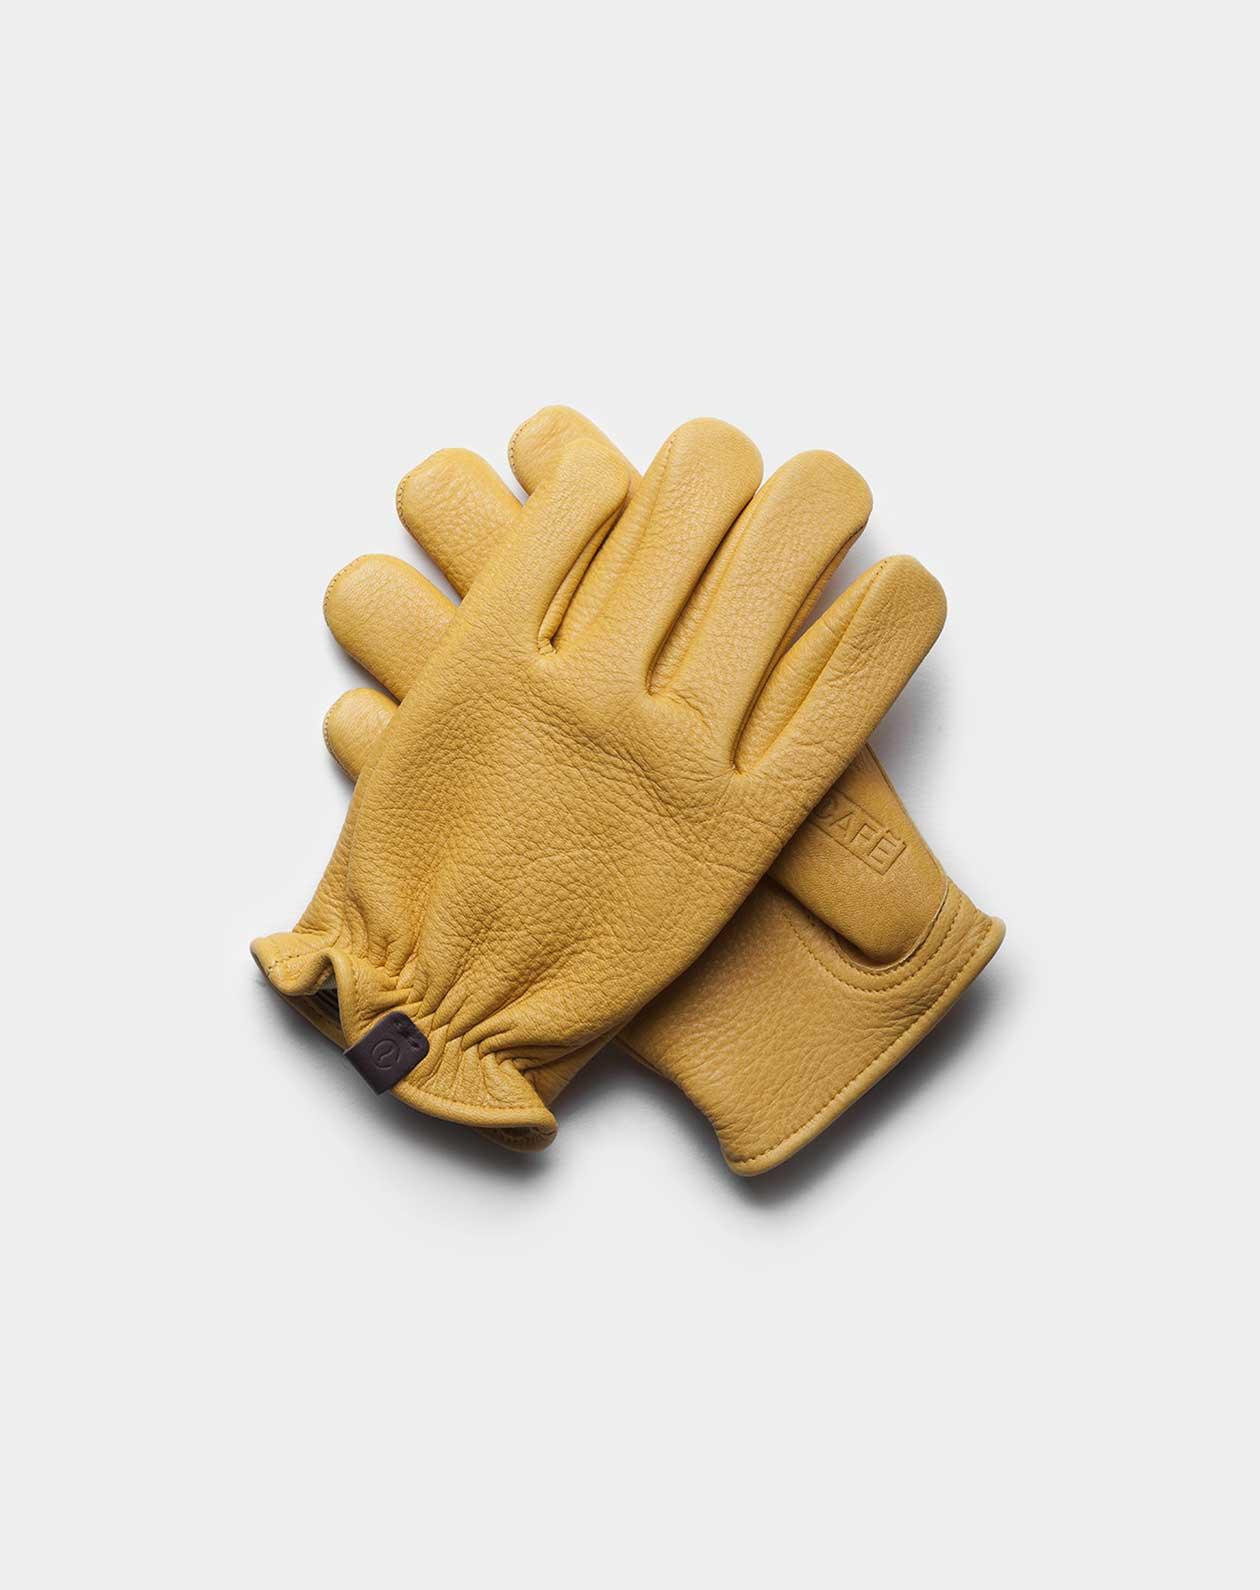 deerskin gloves yellow